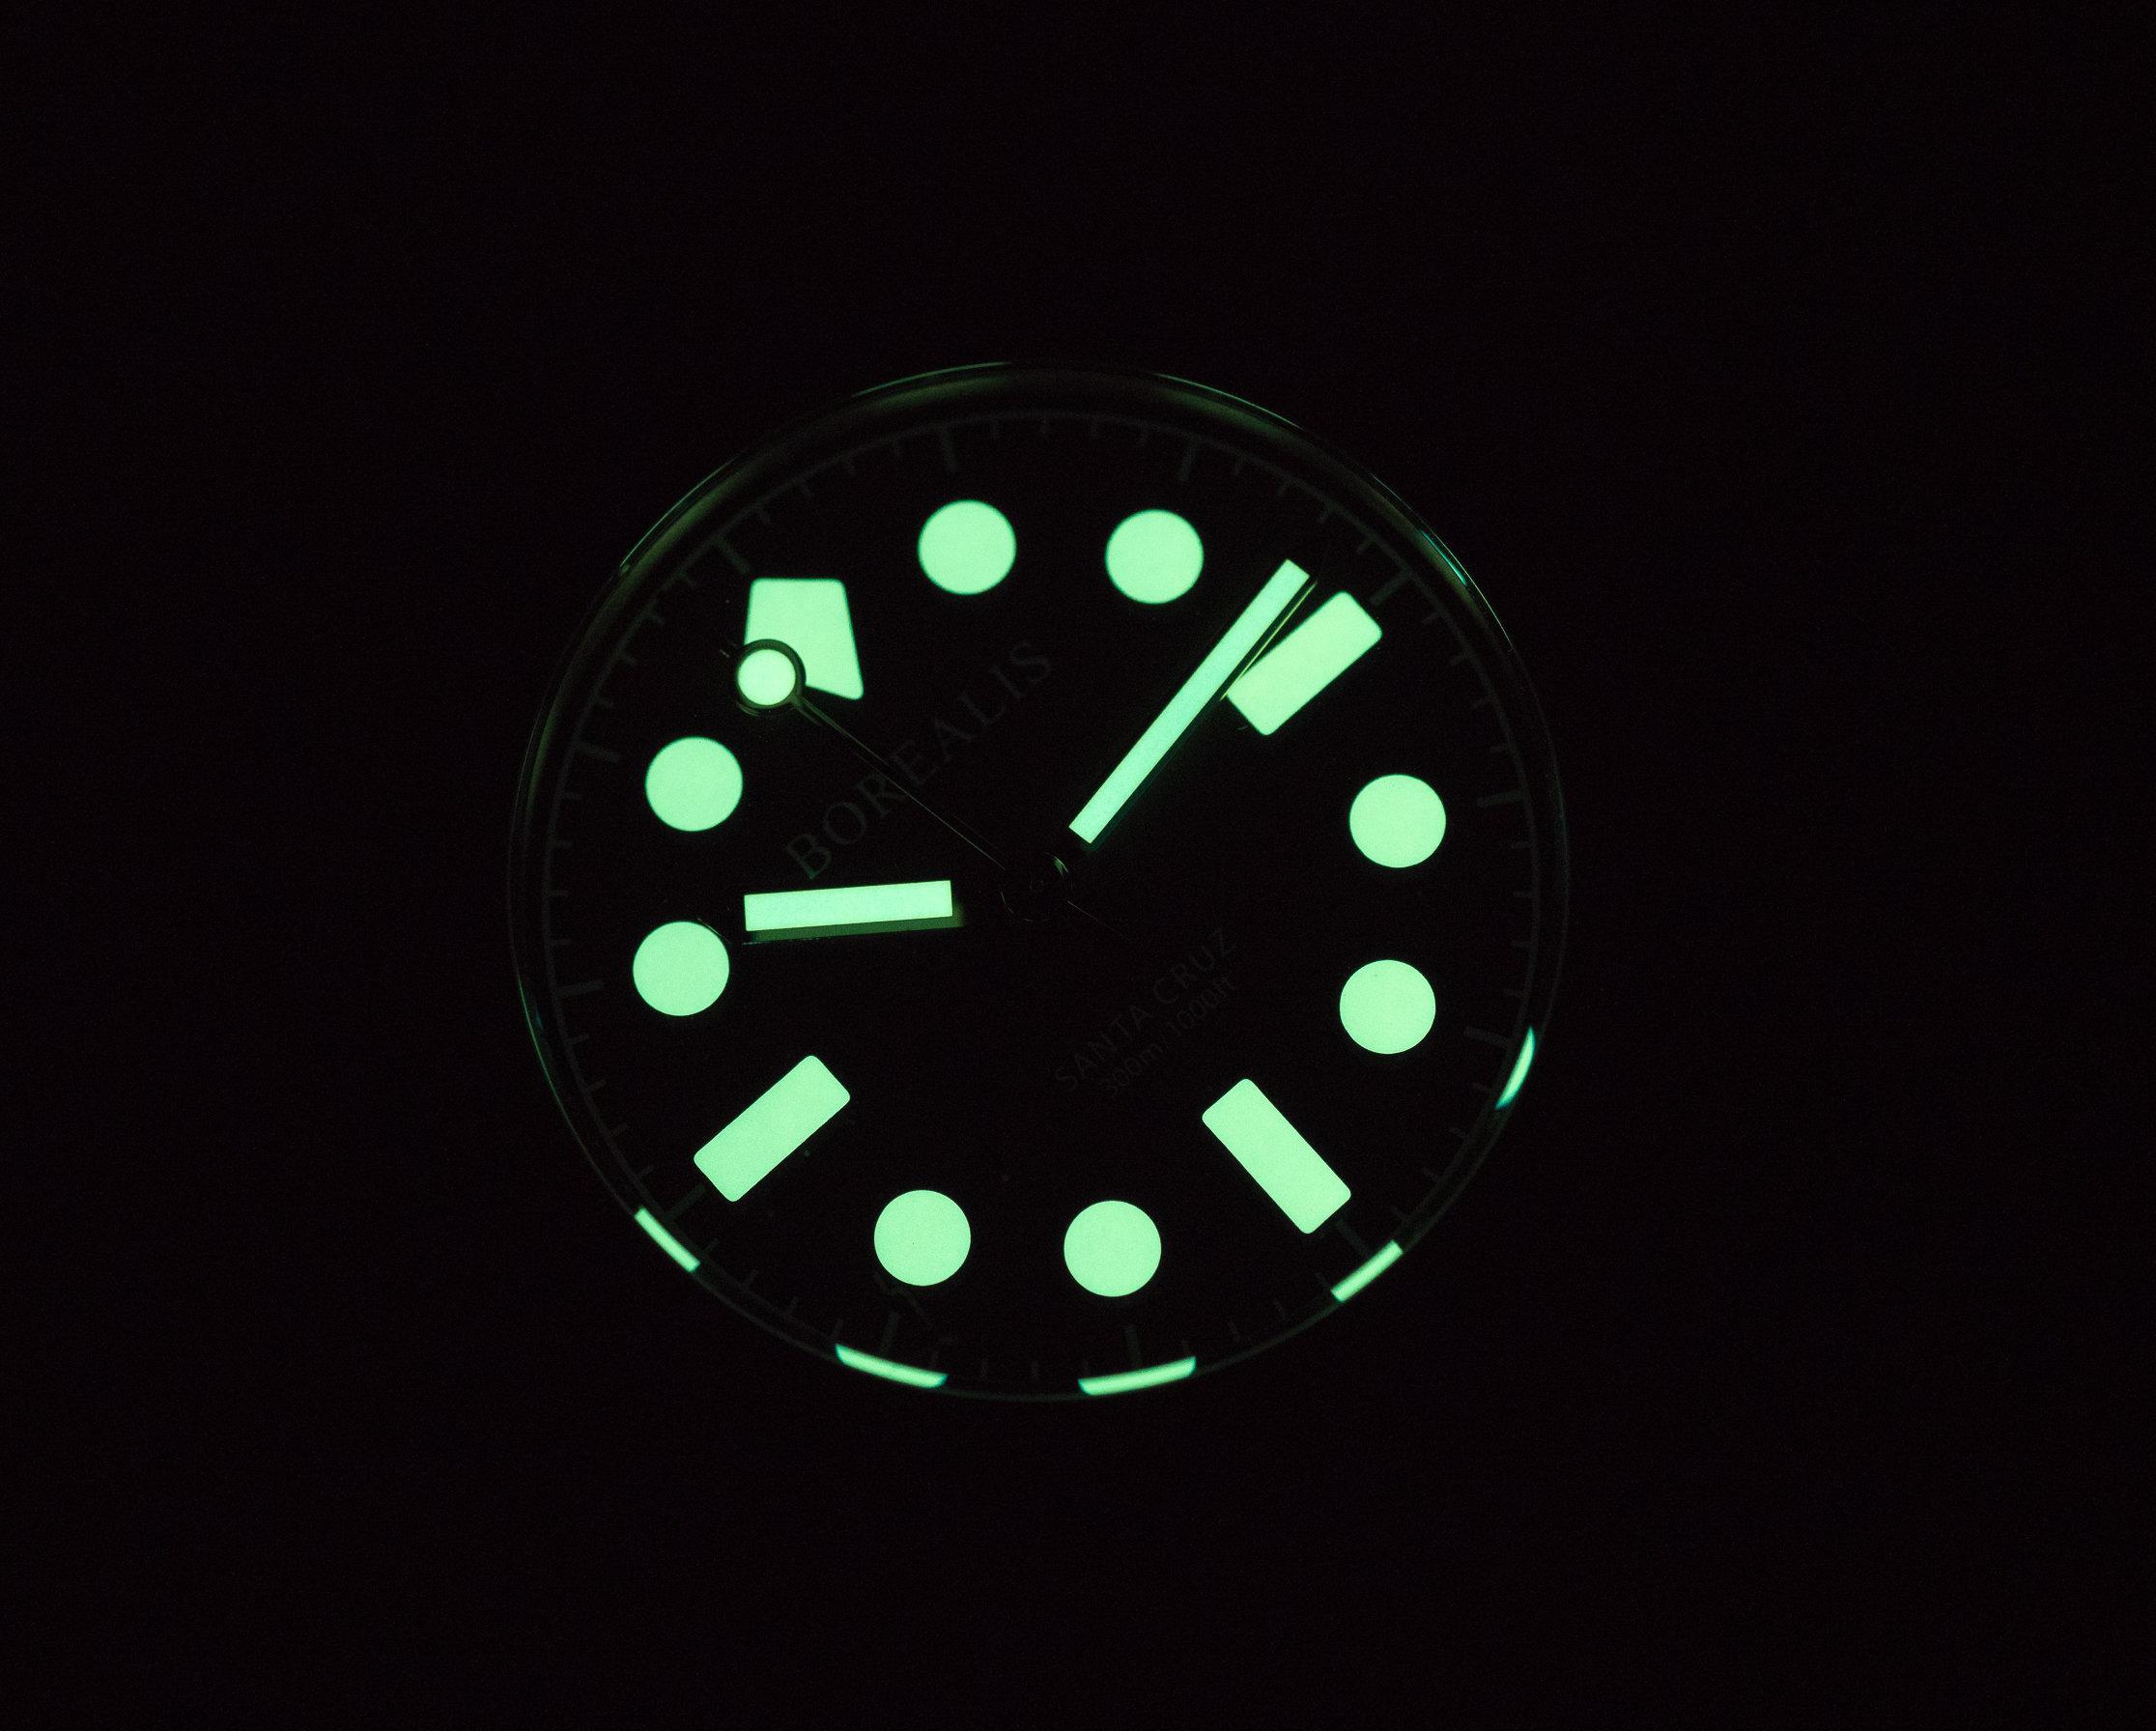 PRE-ORDER Borealis Santa Cruz CuSn8 Bronze Diver Watch Automatic NH38 Movement Type B